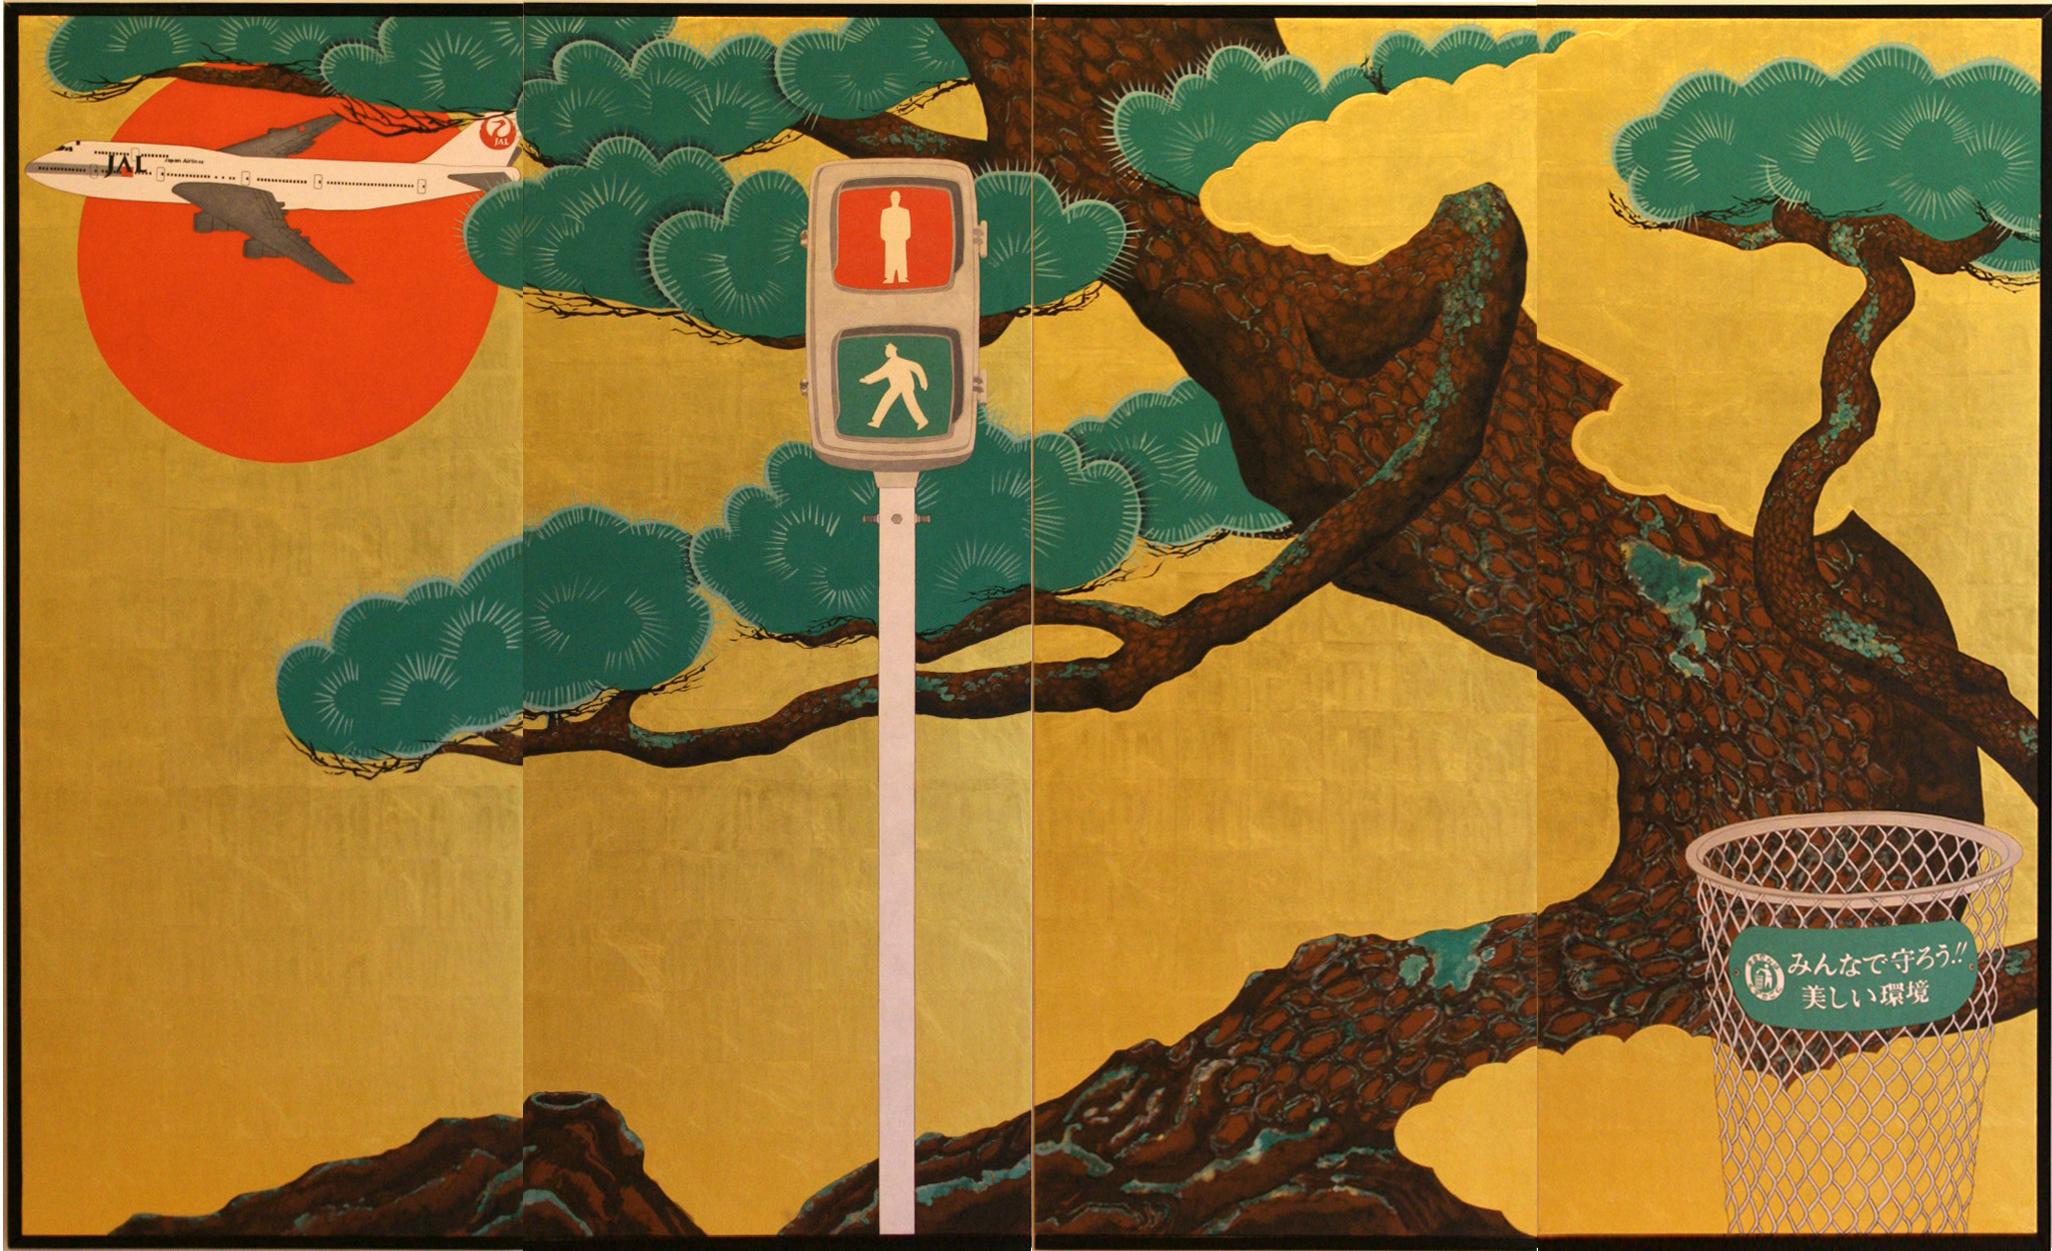 「松樹鉄鶴図」 2001年制作 183×296cm 紙本金地着色 ©️Taro Yamamoto , courtesy of imura art gallery